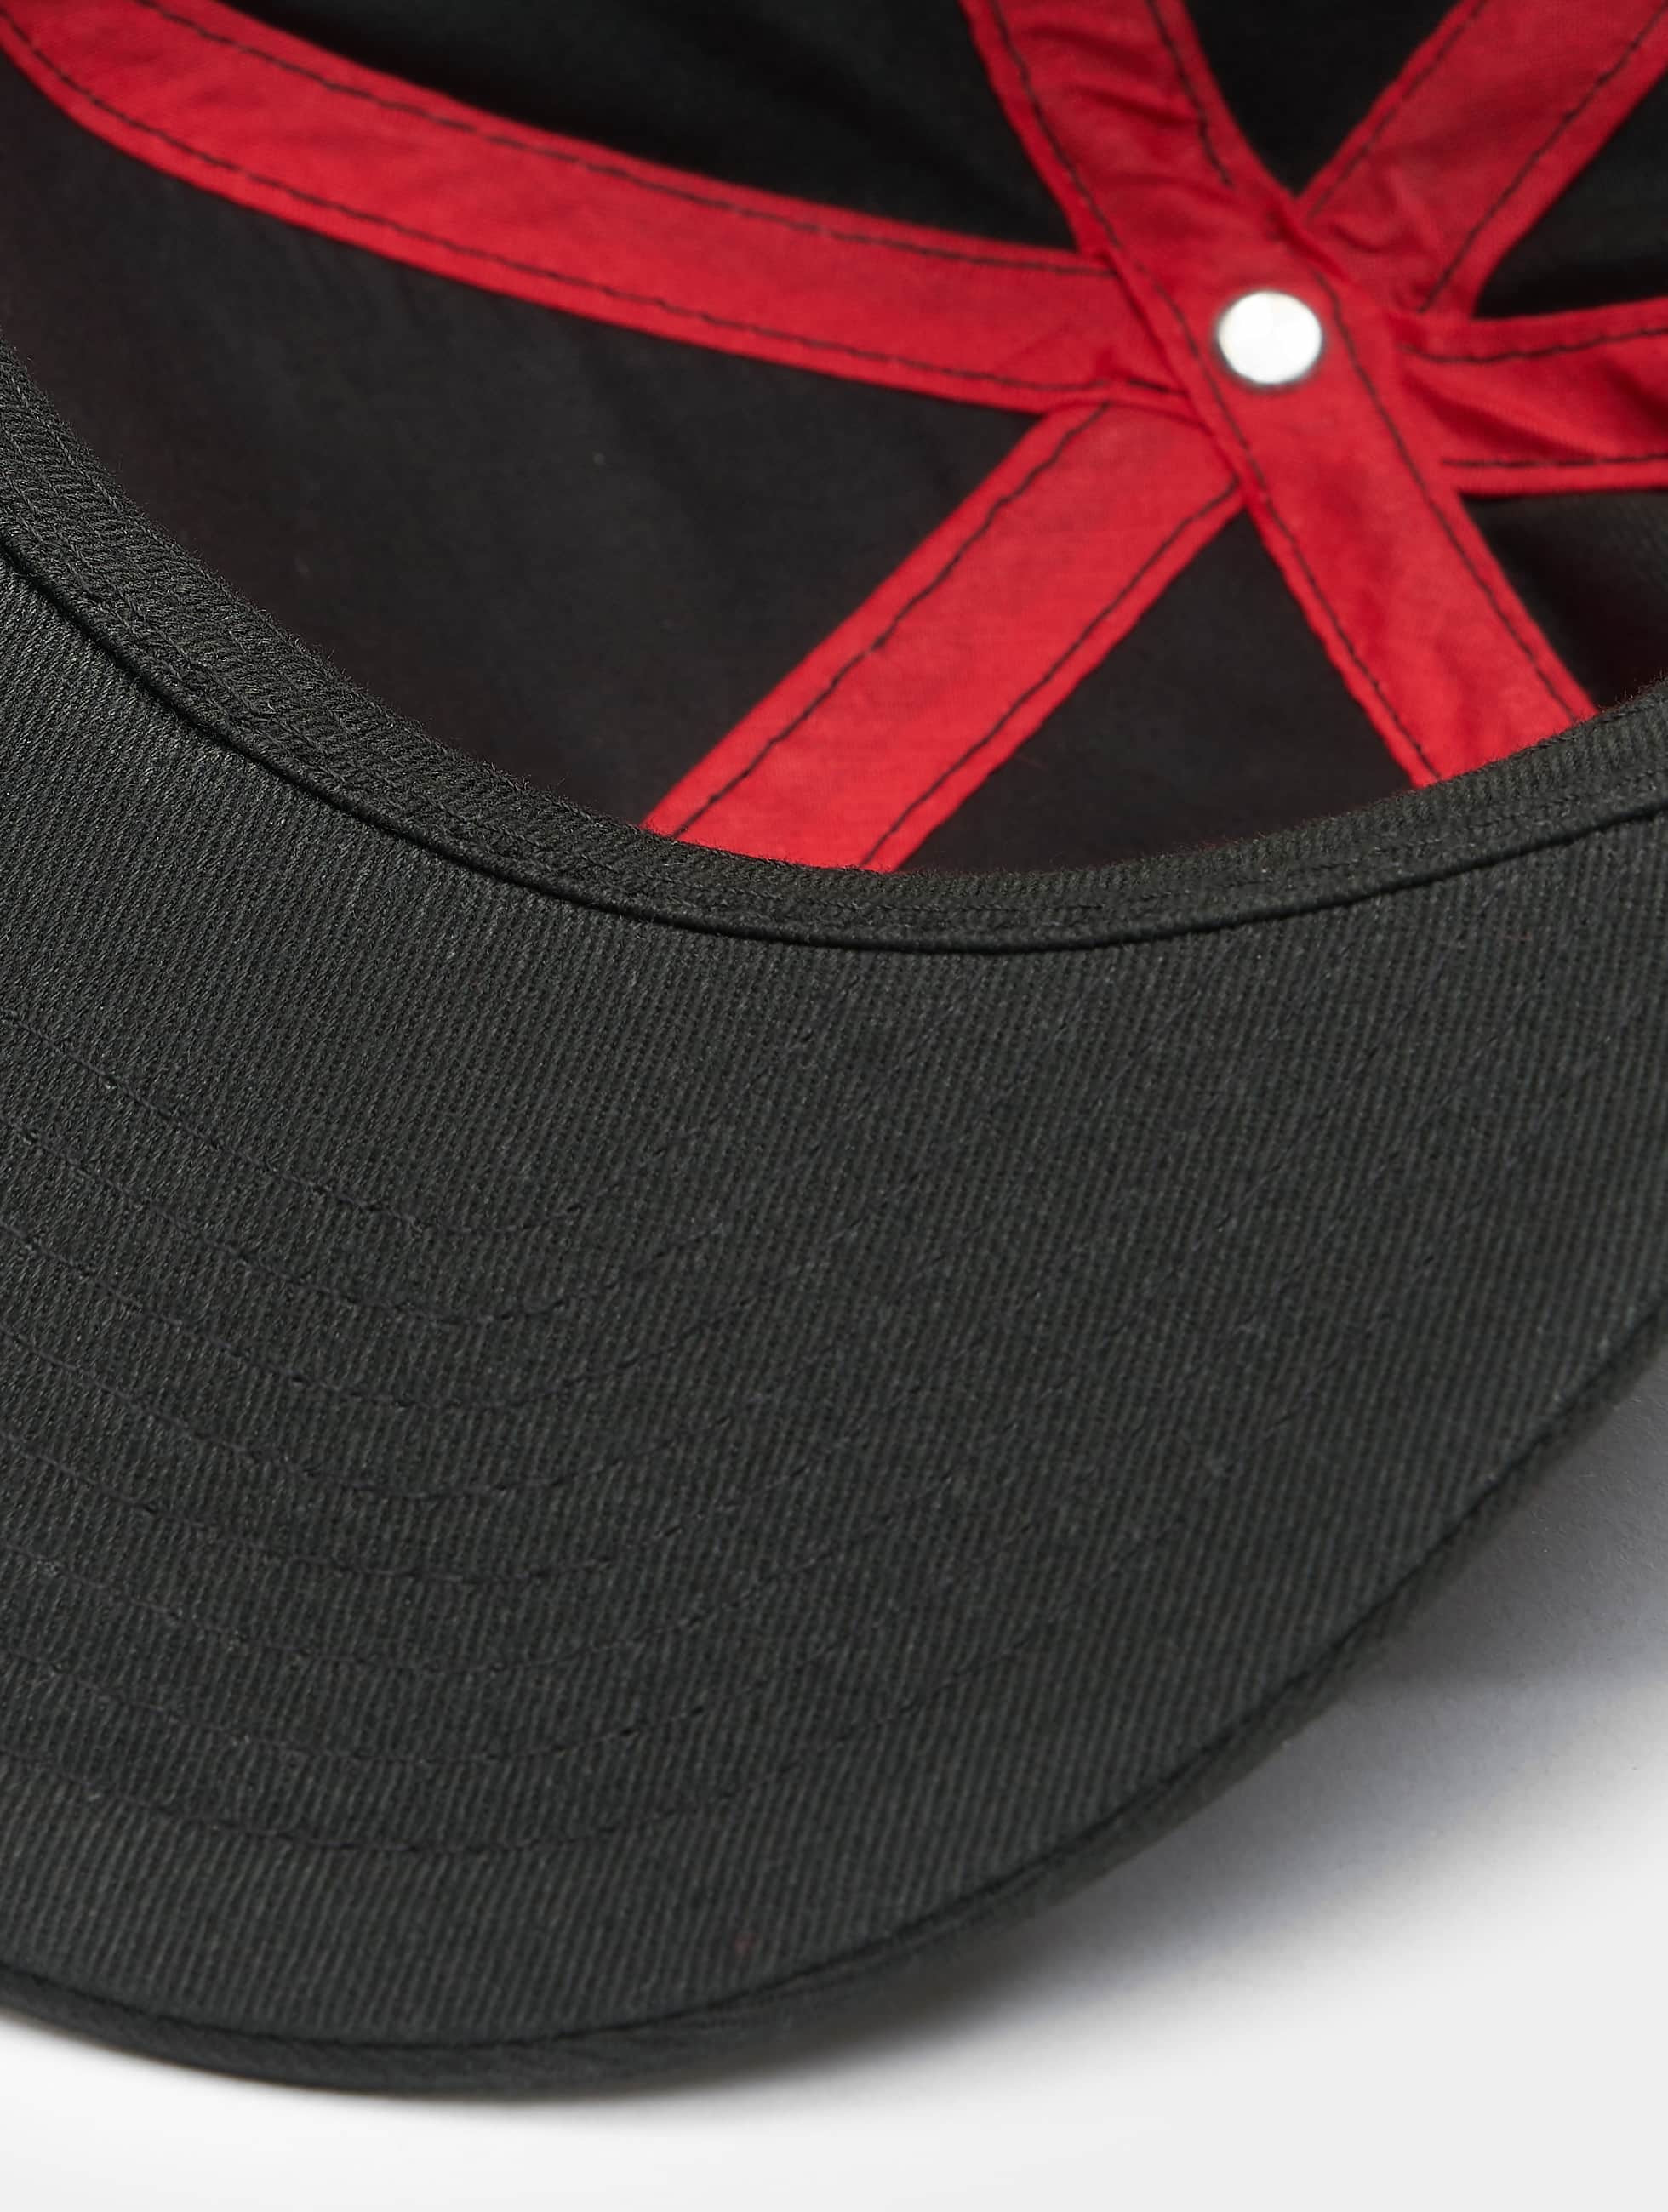 MSTRDS Casquette Snapback & Strapback O Letter noir